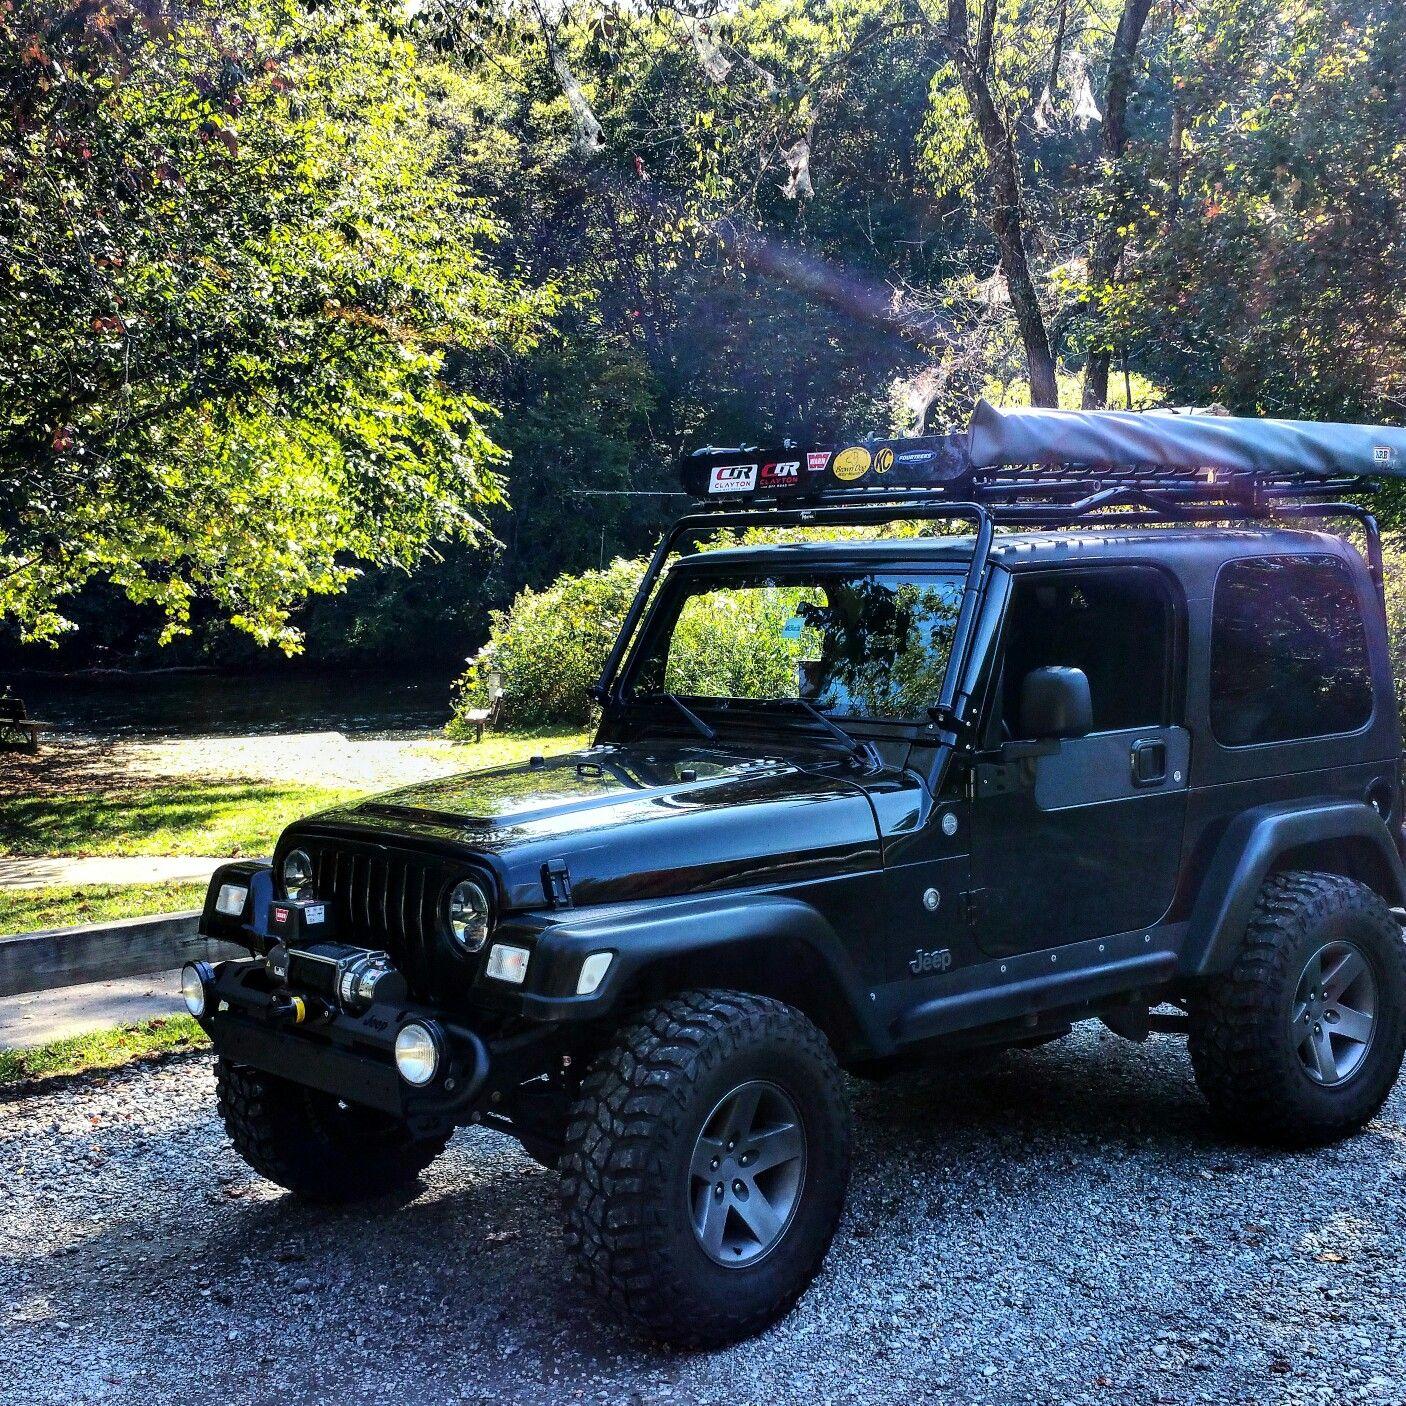 Overland Tj Jeep Wrangler Tj Jeep Tj Jeep Wrangler